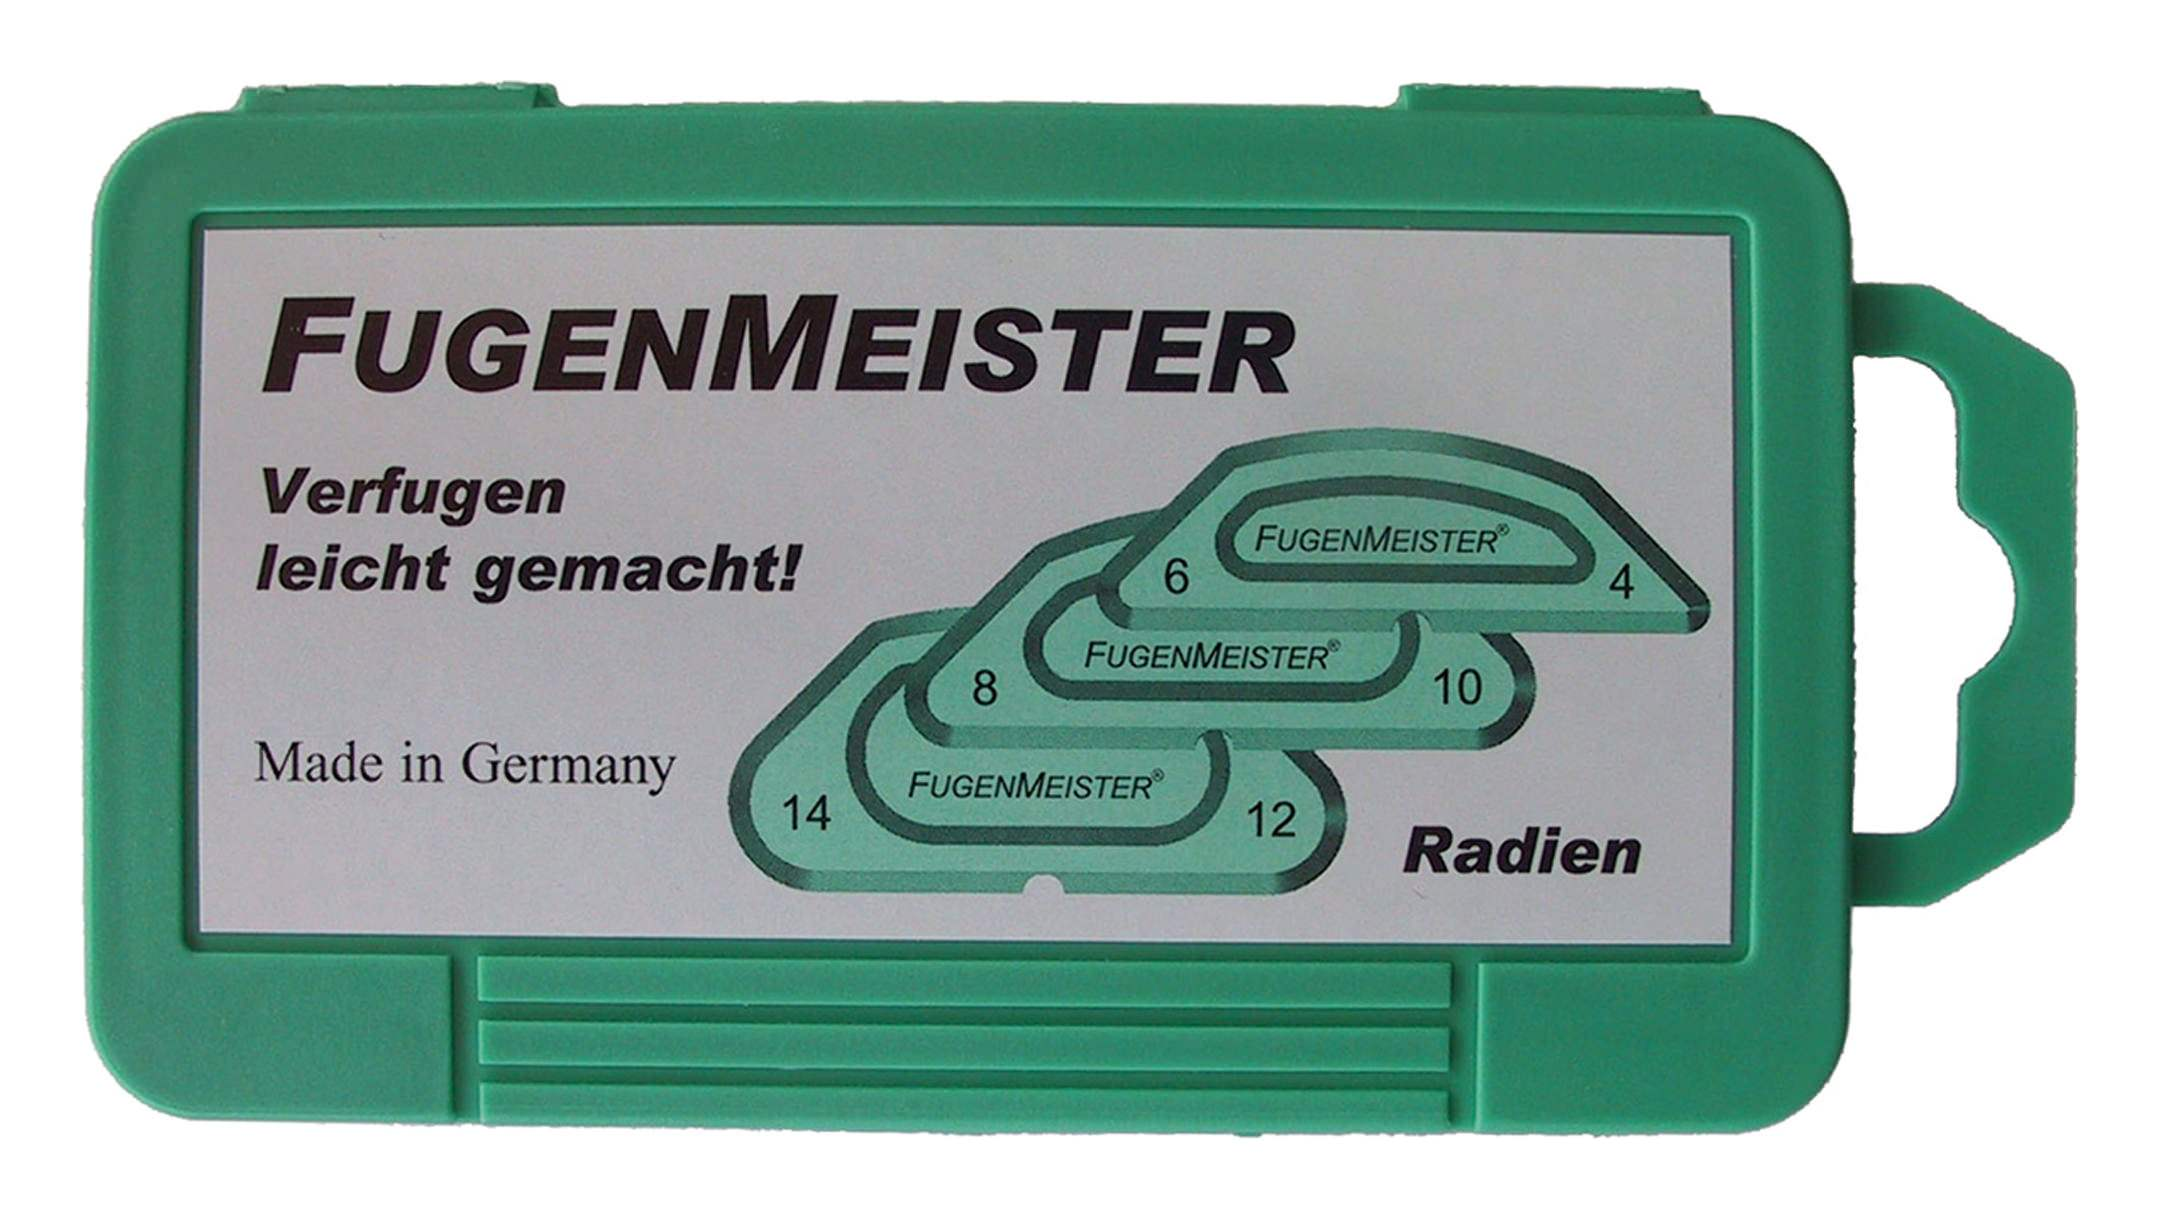 Fugenmeister Radien - R-03